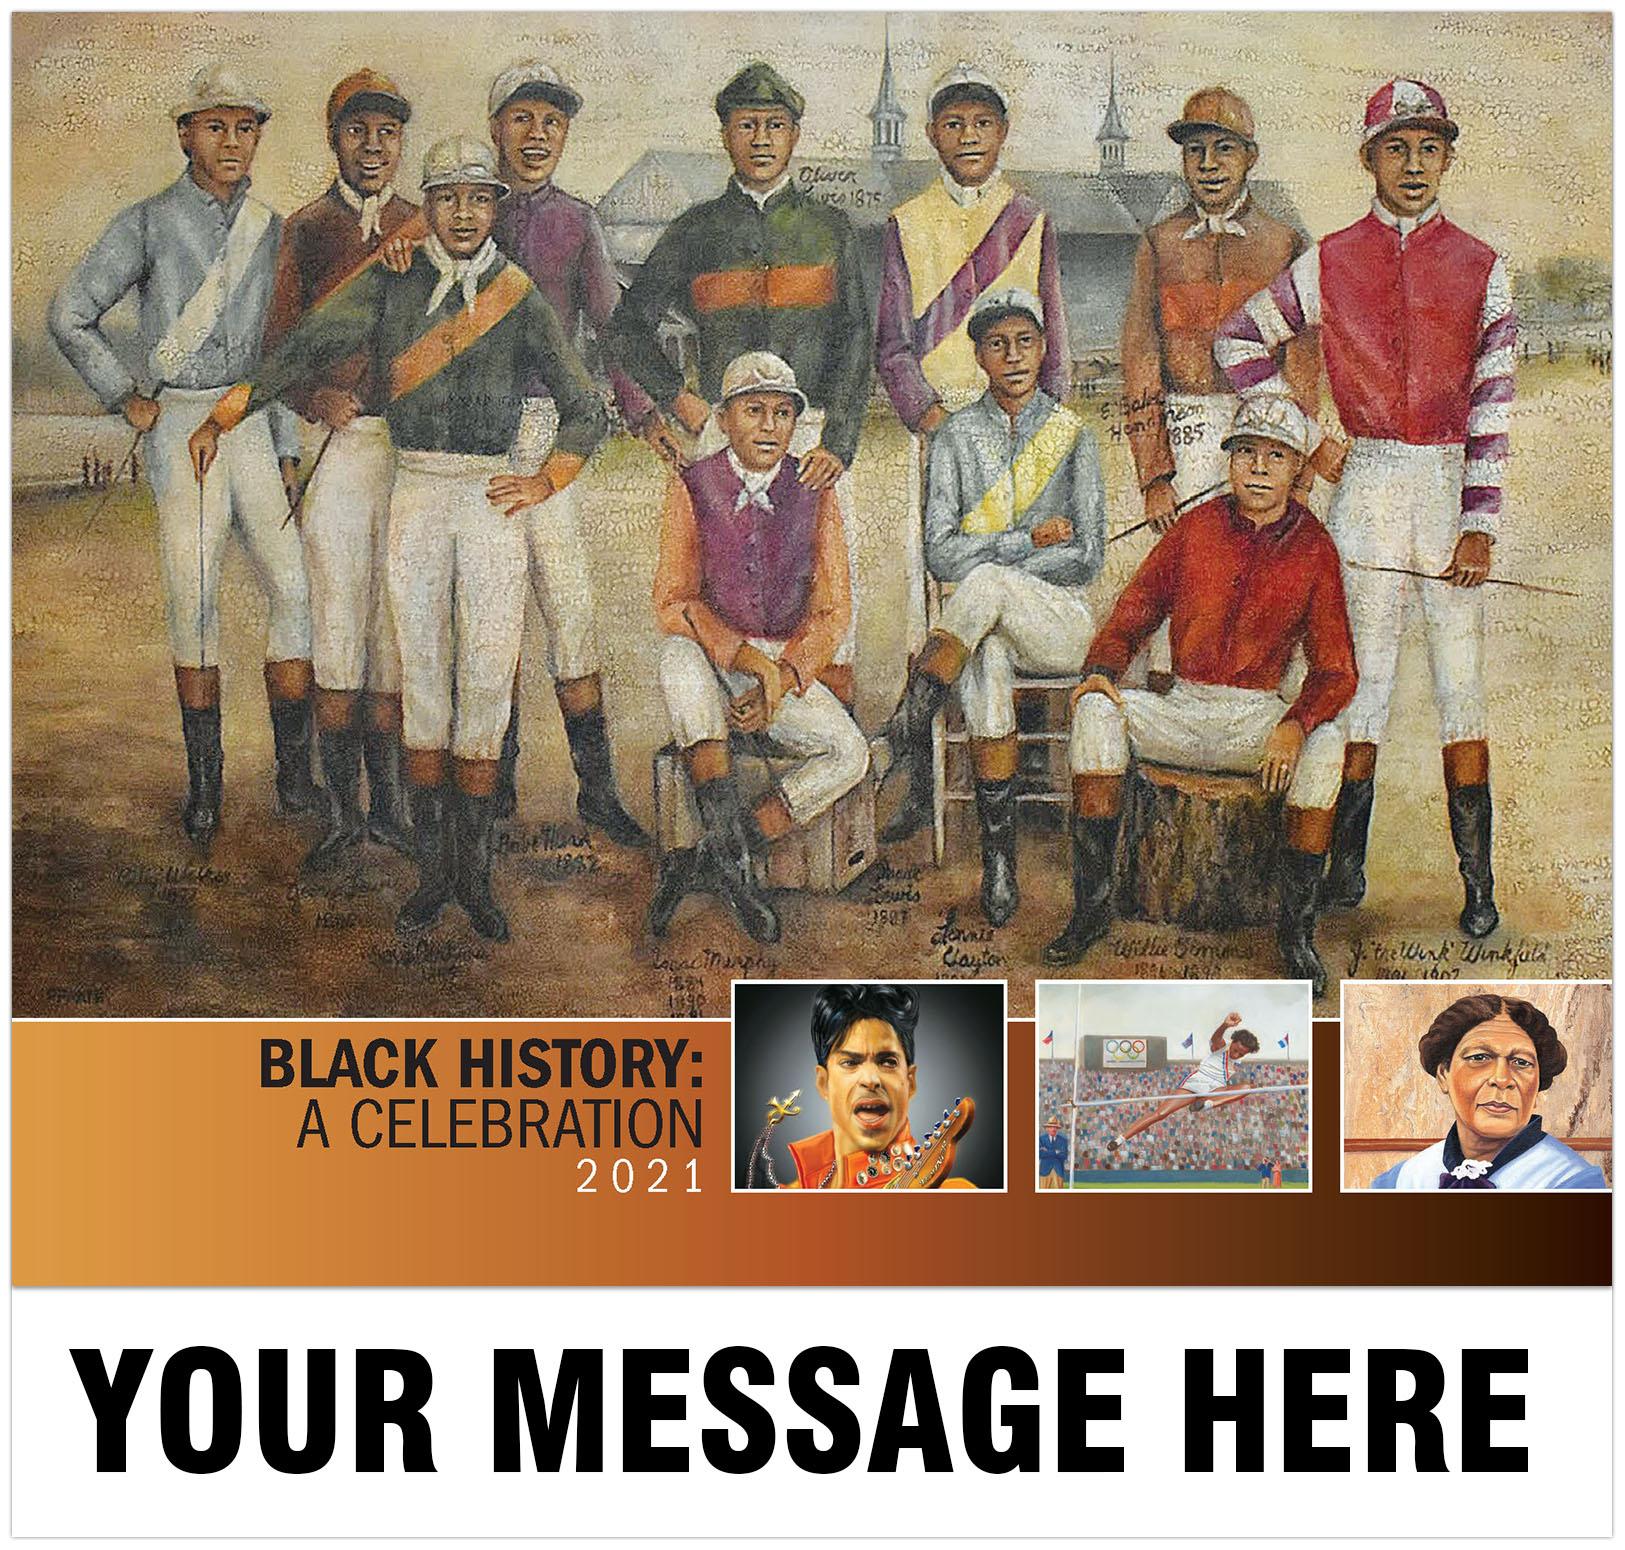 2021 Black History Promotional Calendar